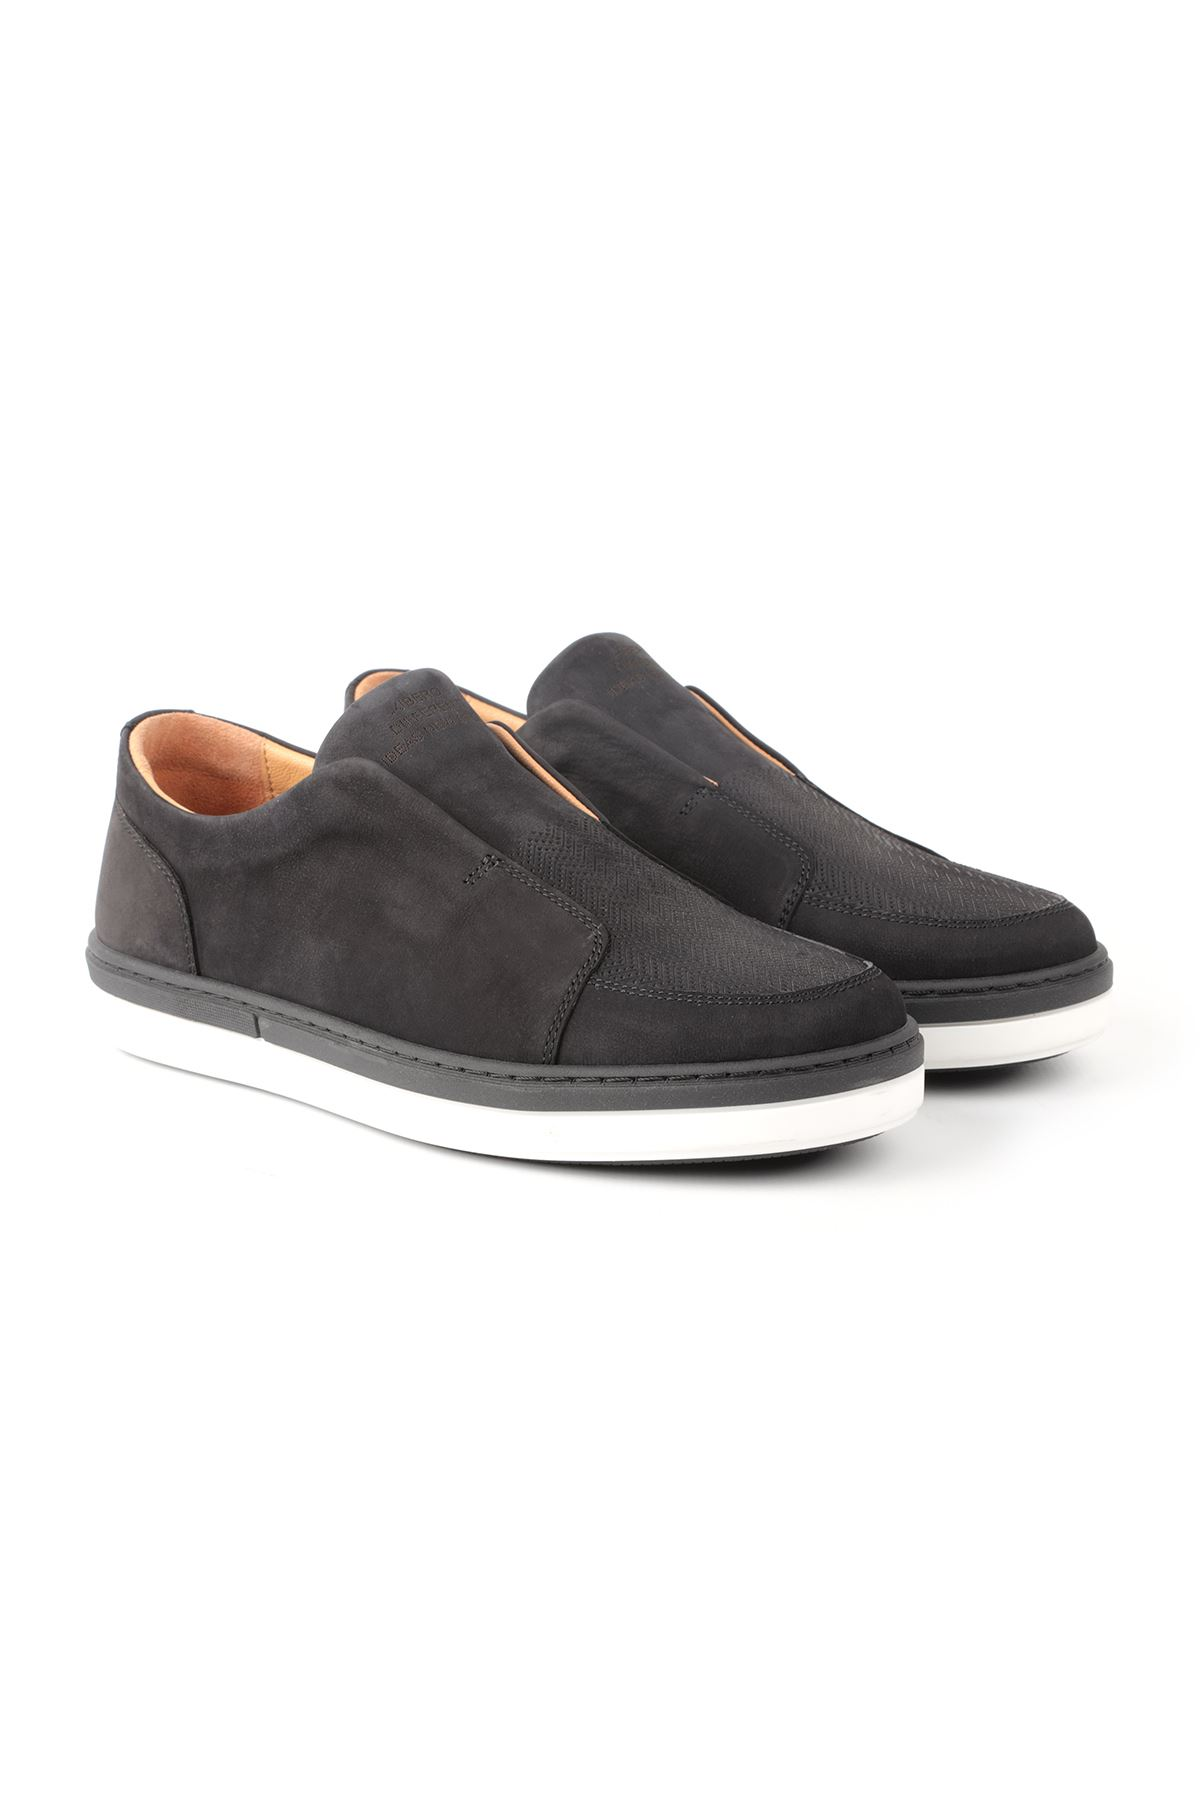 Libero L3680 Black Men's Sport Shoes